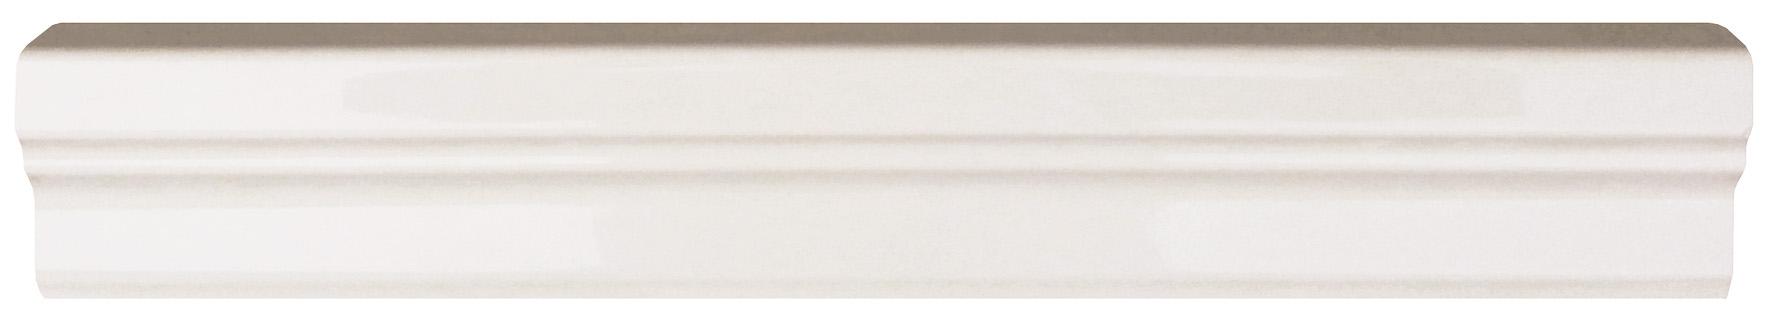 Бордюр FAP Ceramiche Manhattan +14240 White London бордюр fap fusion fusion white london 4x25